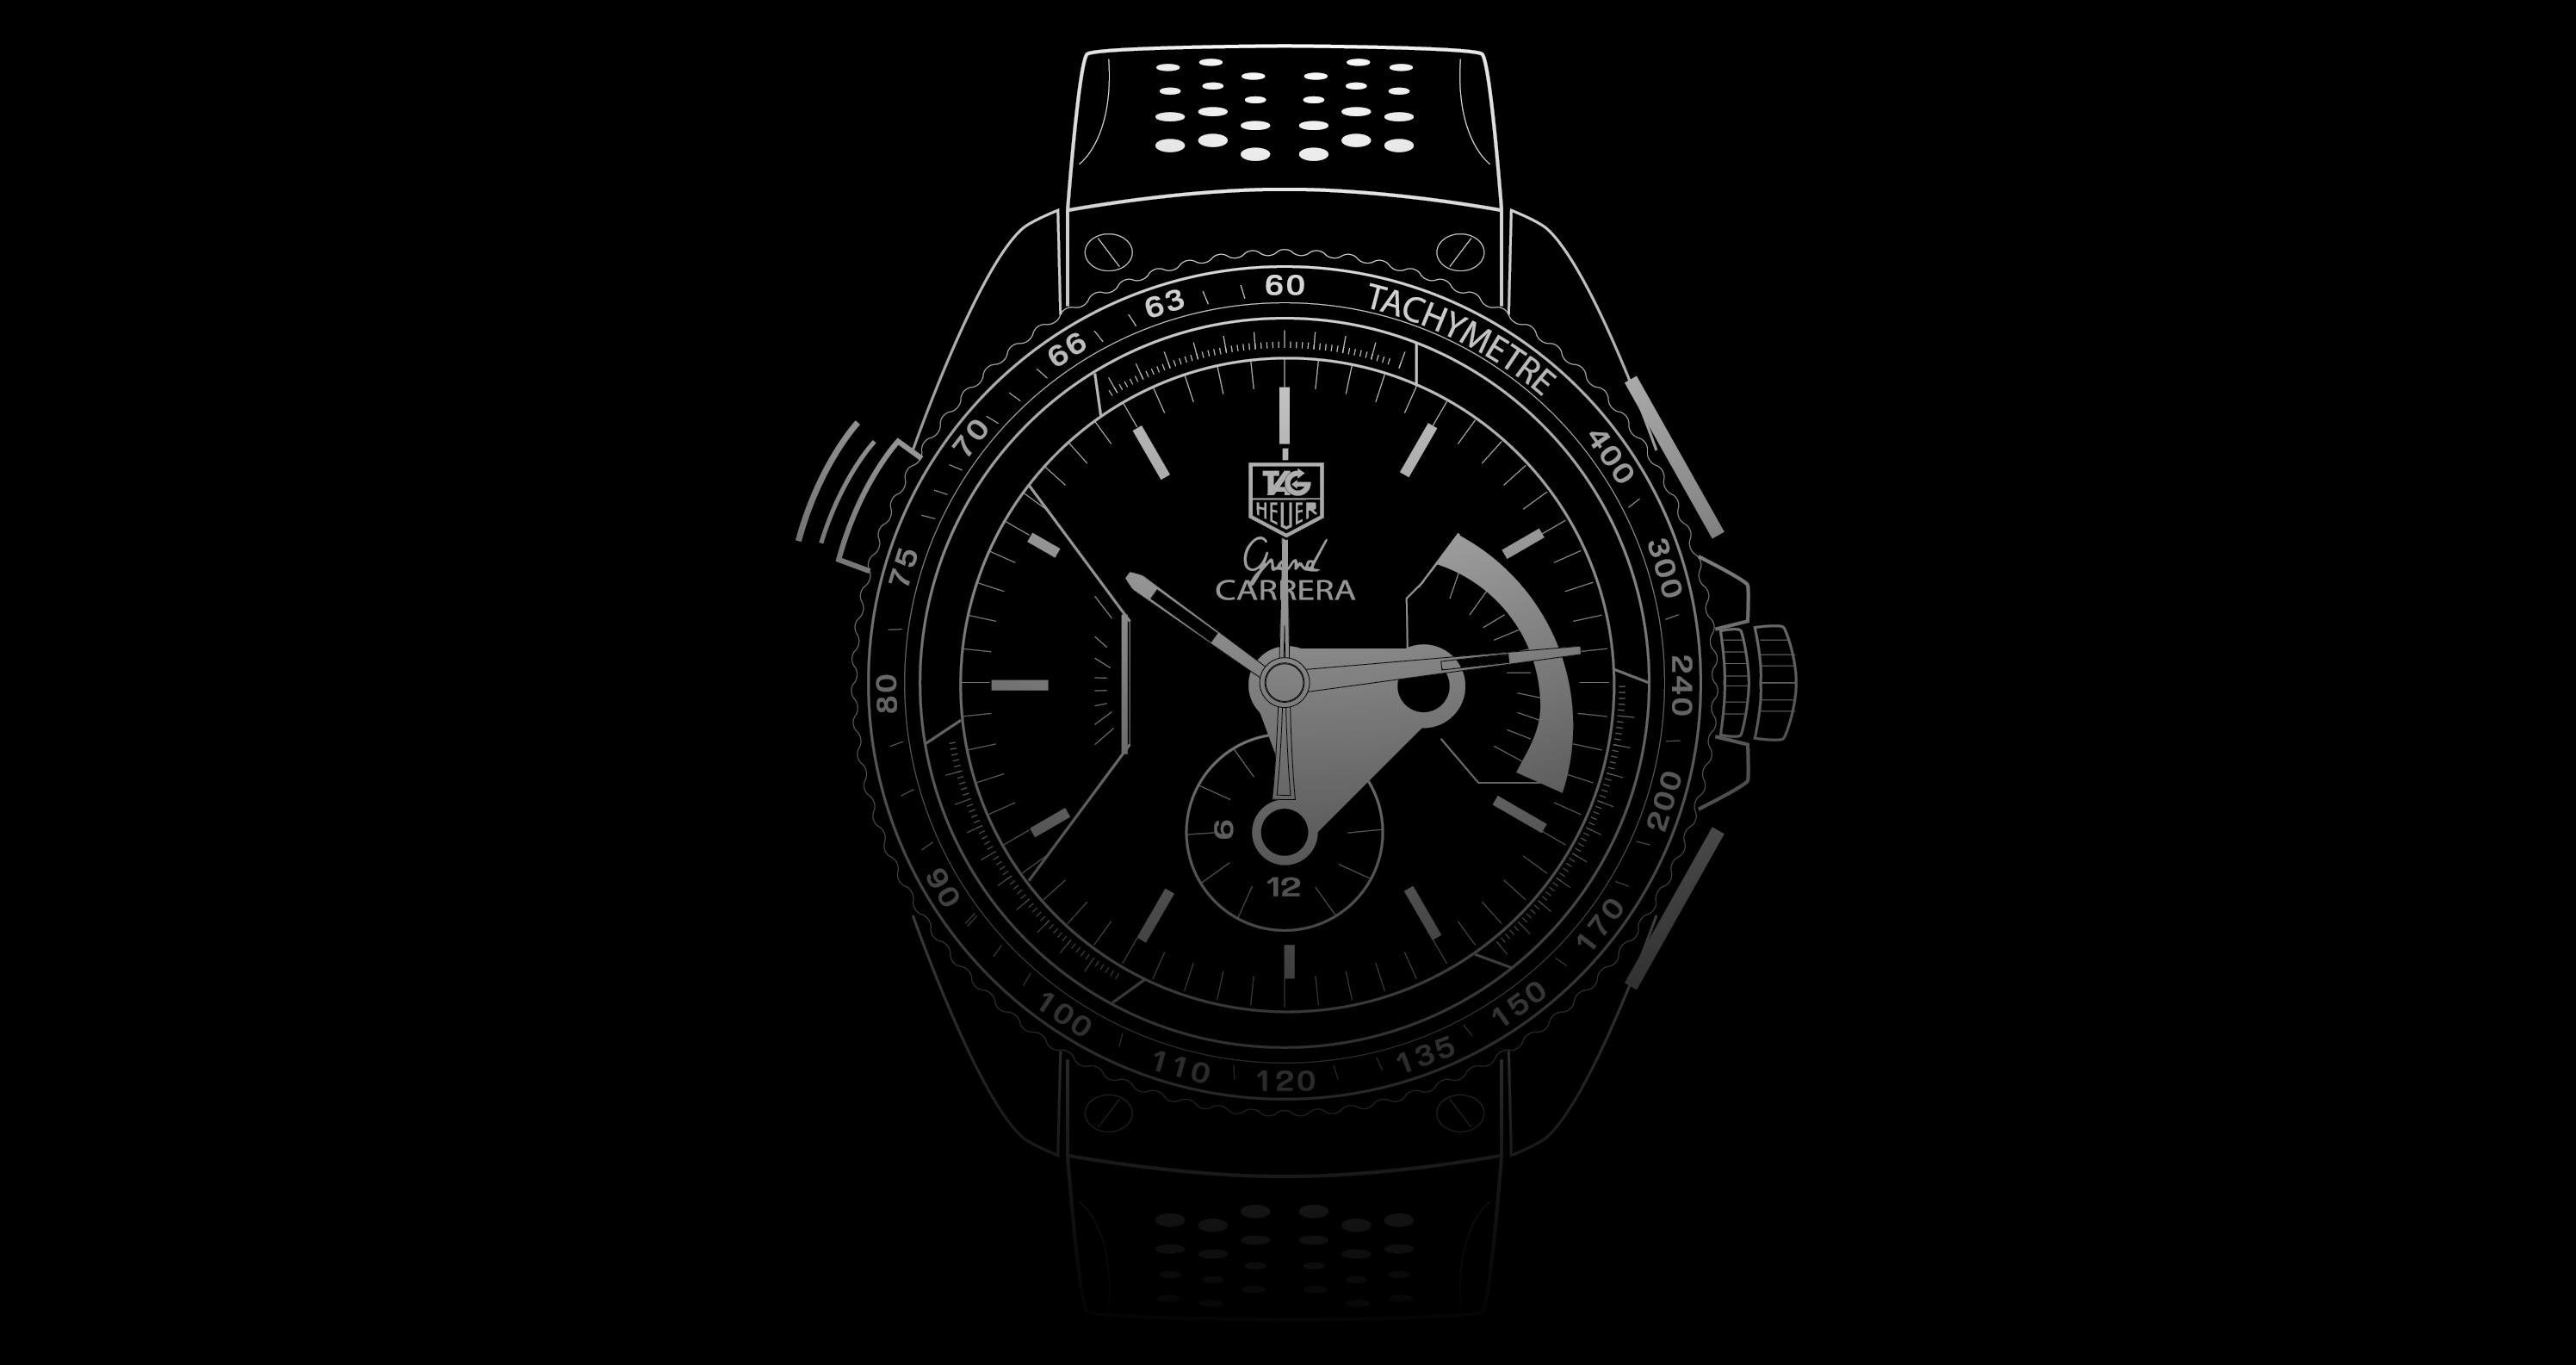 3b4c5bfb6b8 TAG Heuer Grand Carrera - Infos, Price & History | CHRONEXT